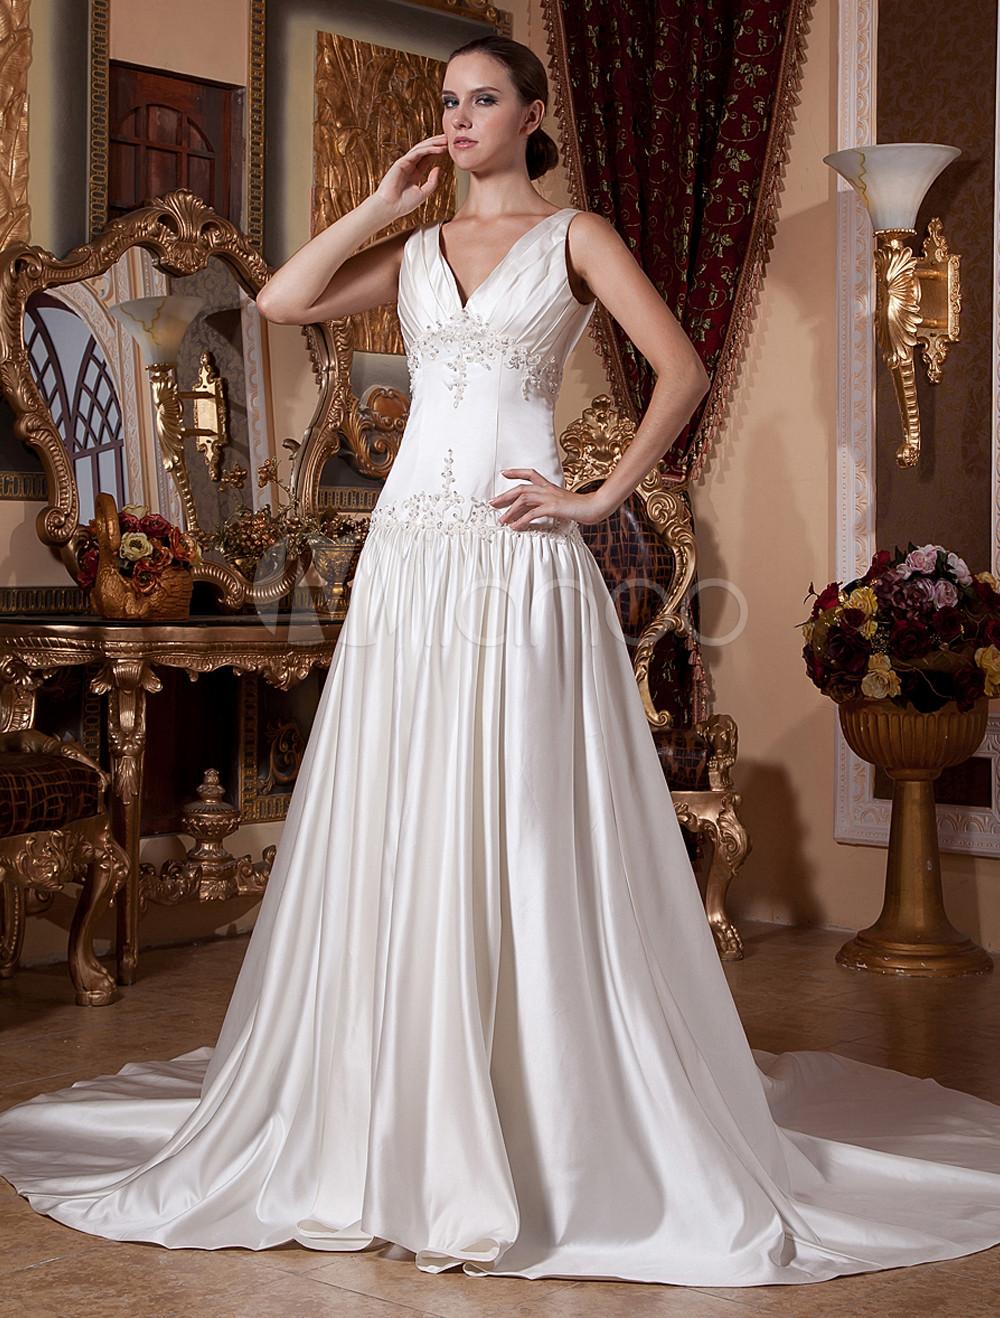 Slimming Ivory Satin V Neck Sleeveless A Line Wedding Dress